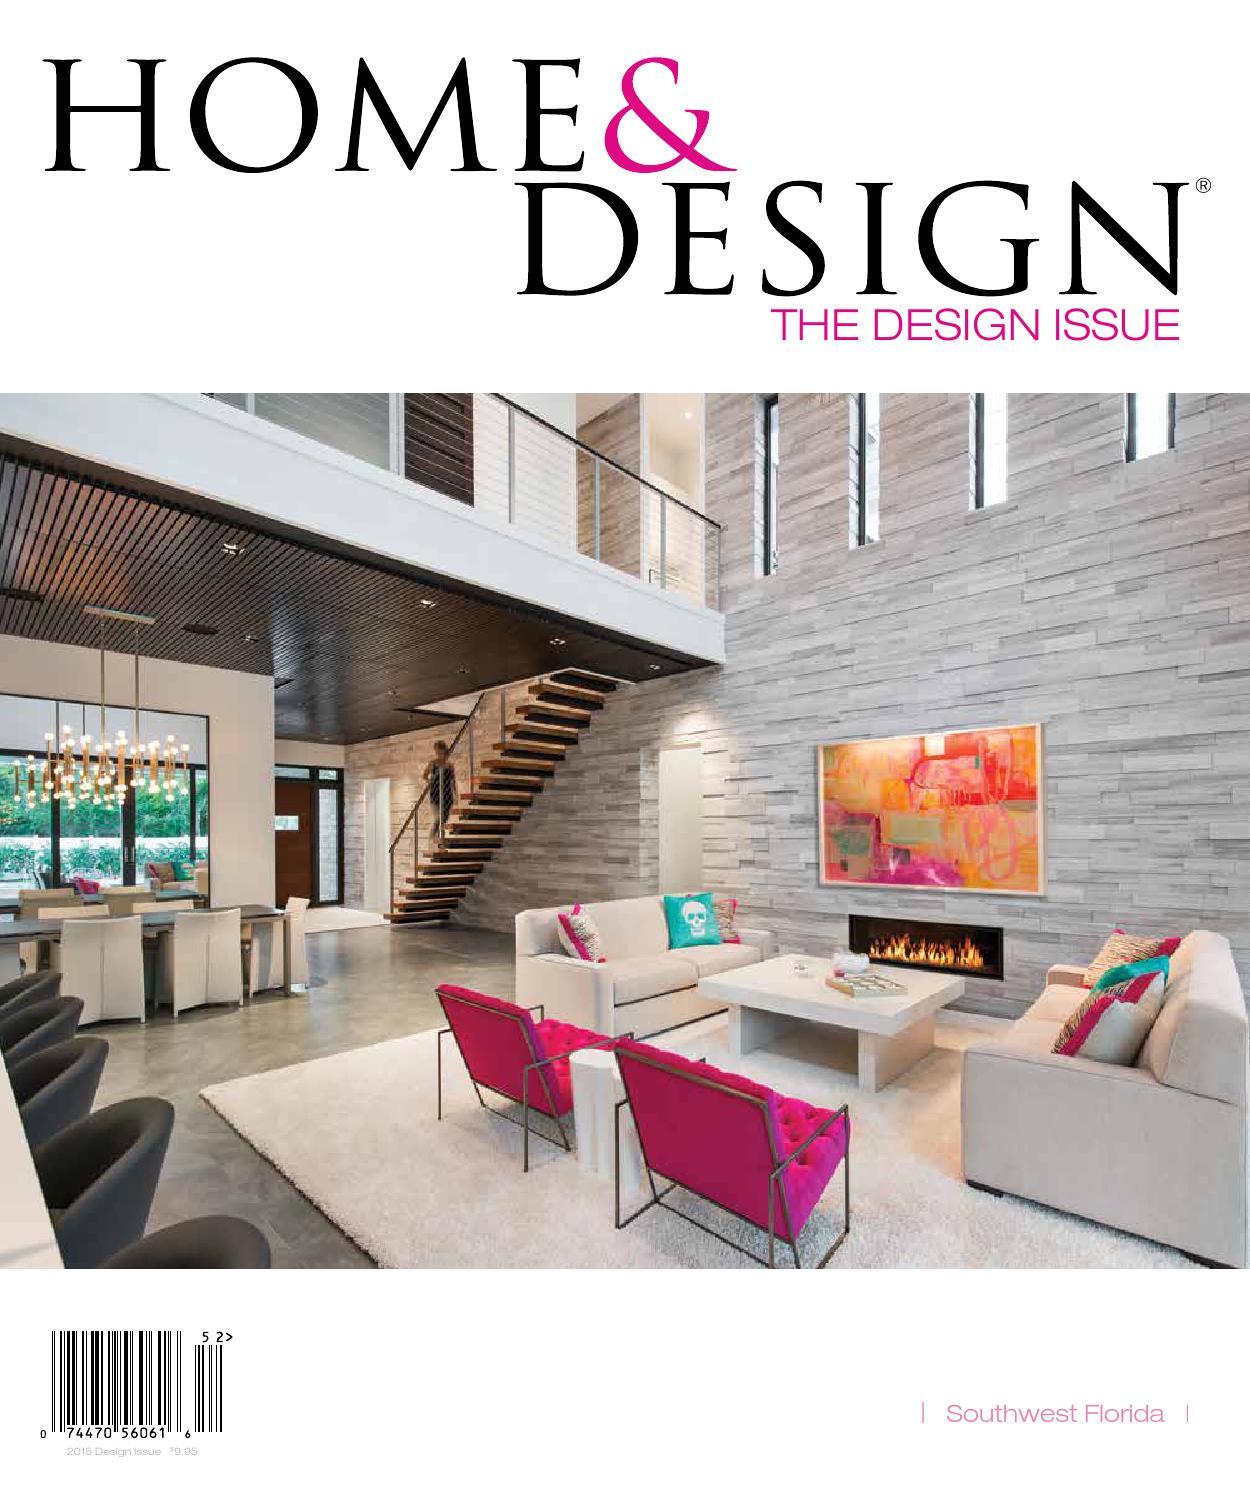 Home  Design Magazine  Design Issue 2015  Southwest